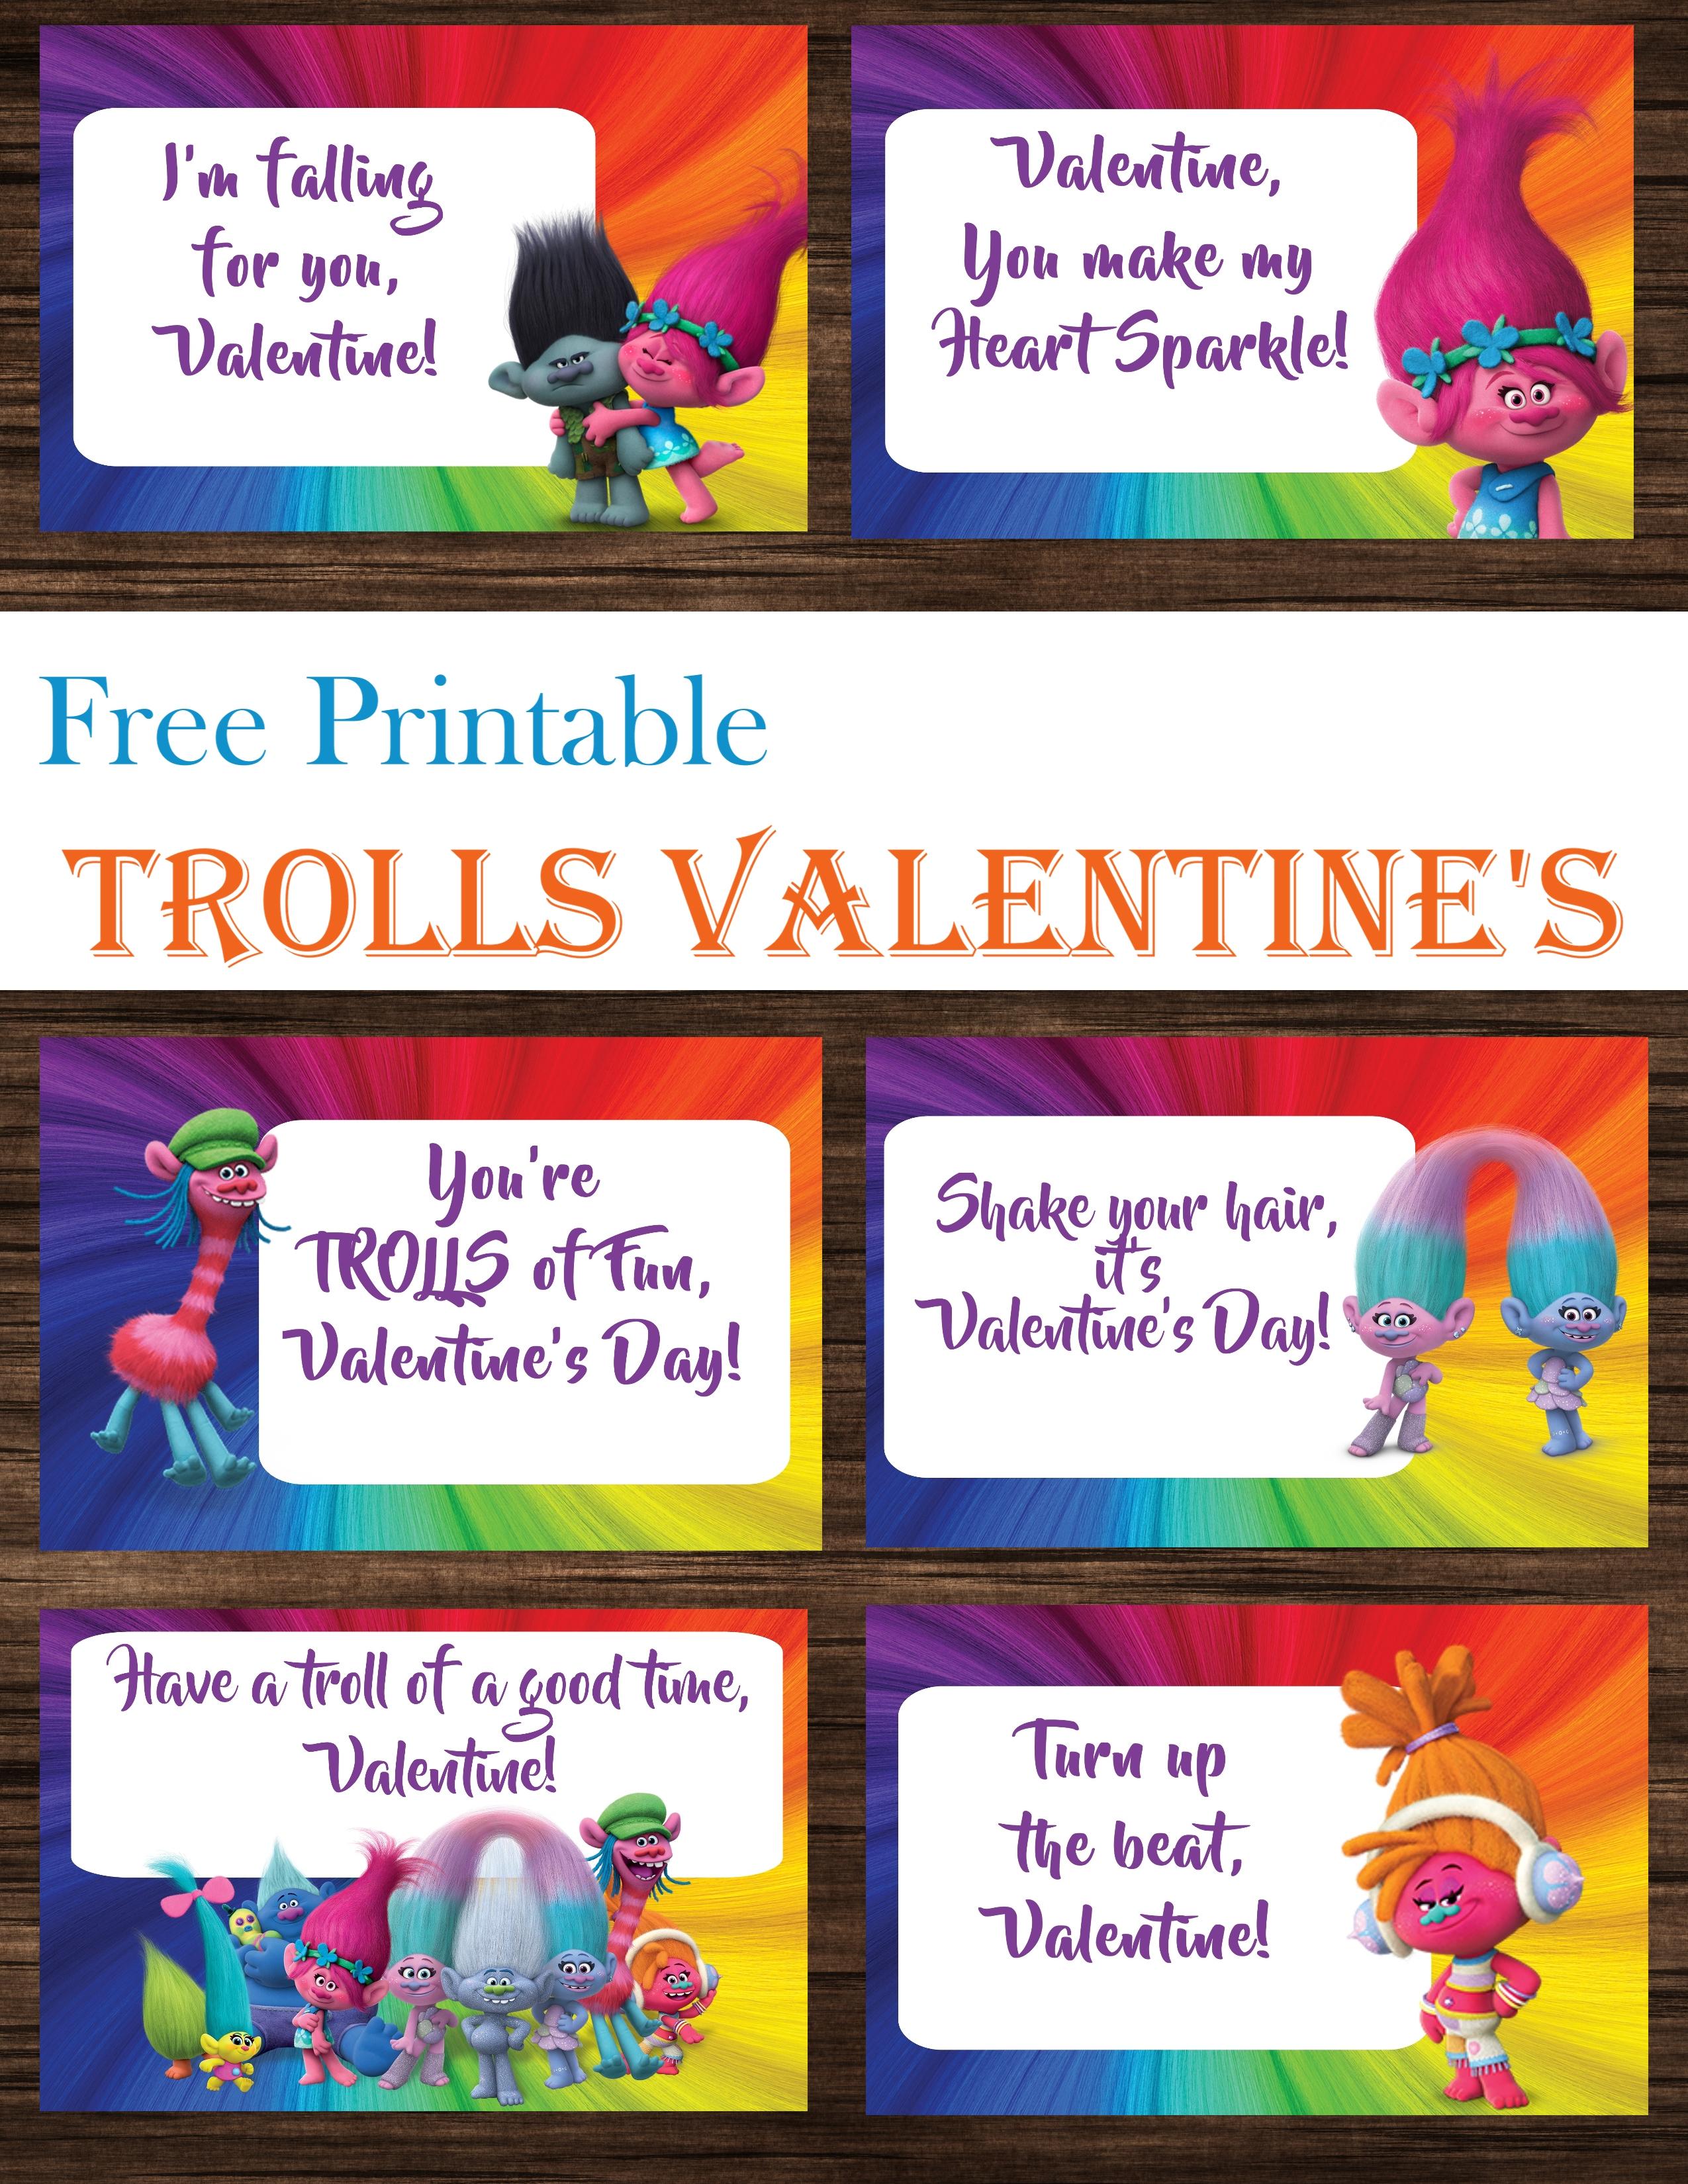 Trolls Valentine's Day Cards Free Printables - Printables 4 Mom - Free Trolls Printables